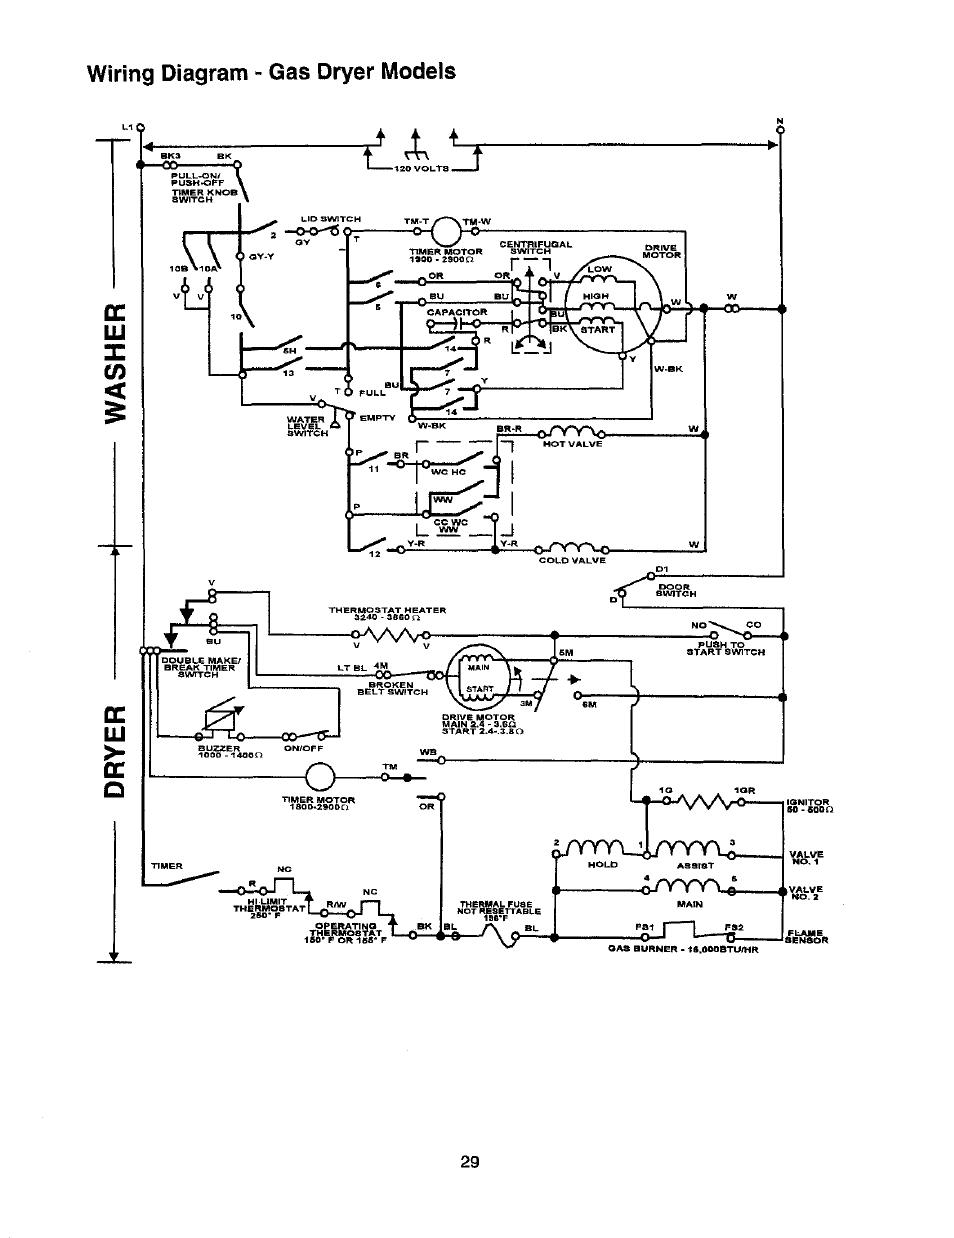 DIAGRAM] Ge Gas Dryer Wiring Diagram FULL Version HD Quality Wiring Diagram  - SOLARDIAGRAM.LADEPOSIZIONEMISTERI.IT | Whirlpool Wiring Diagrams |  | La Deposizione